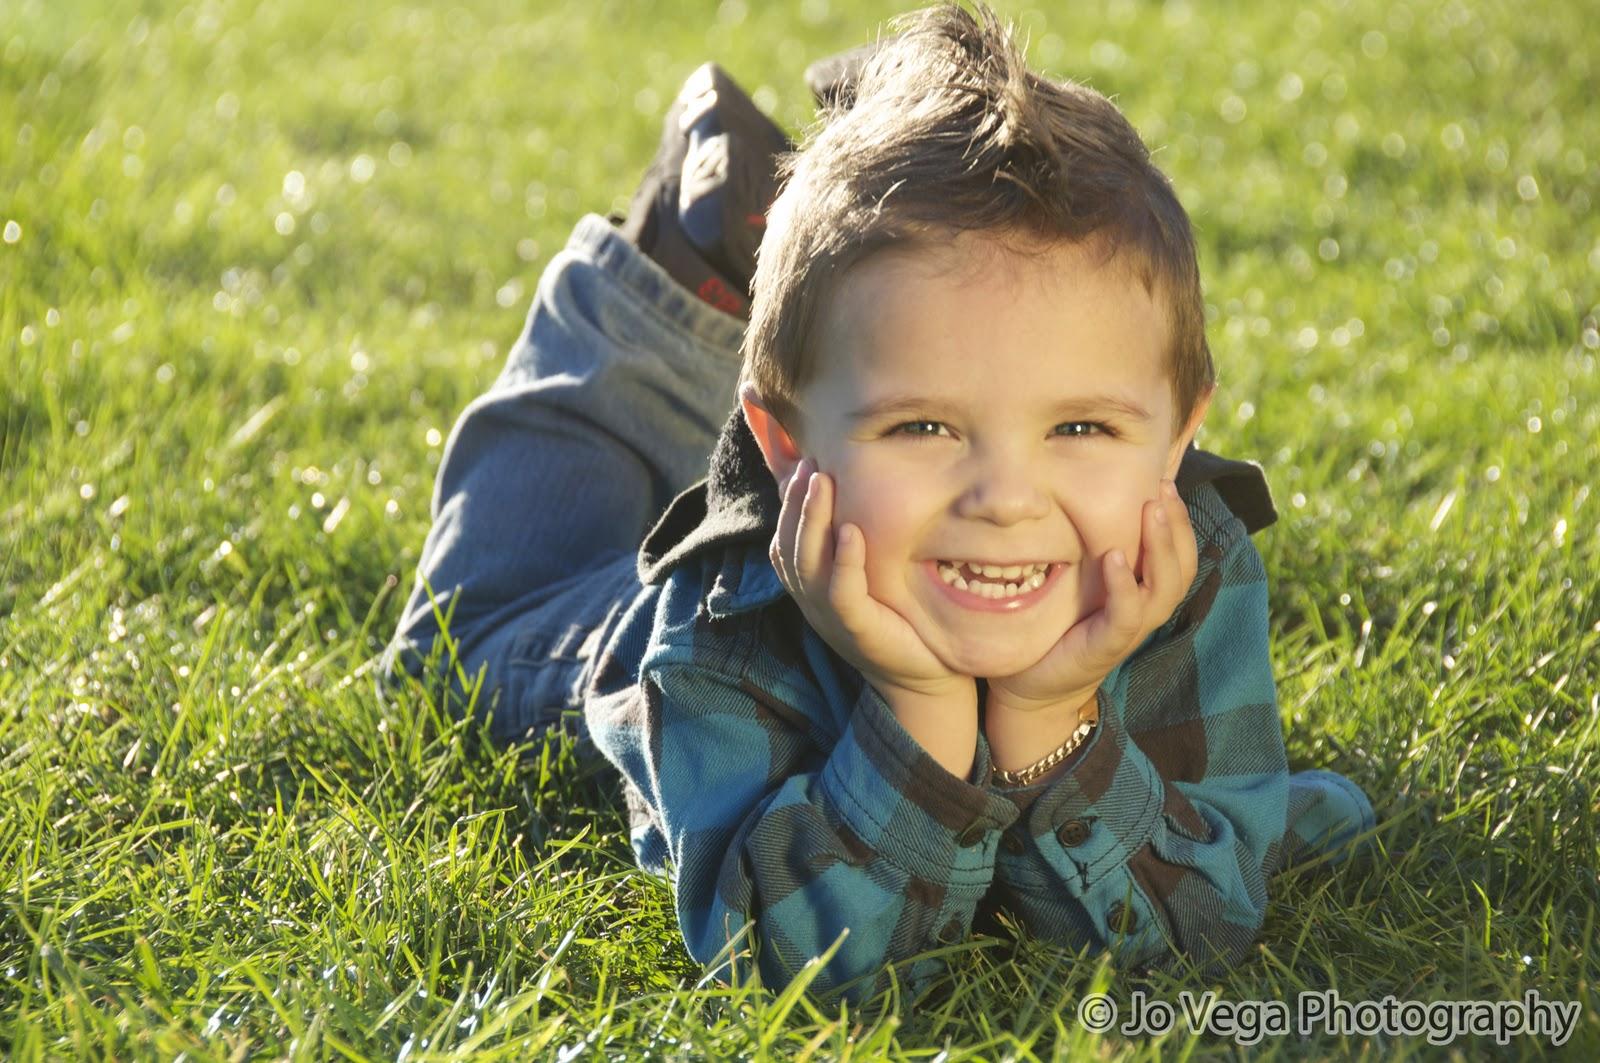 Jo Vega Photography Toddler Photo Shoot